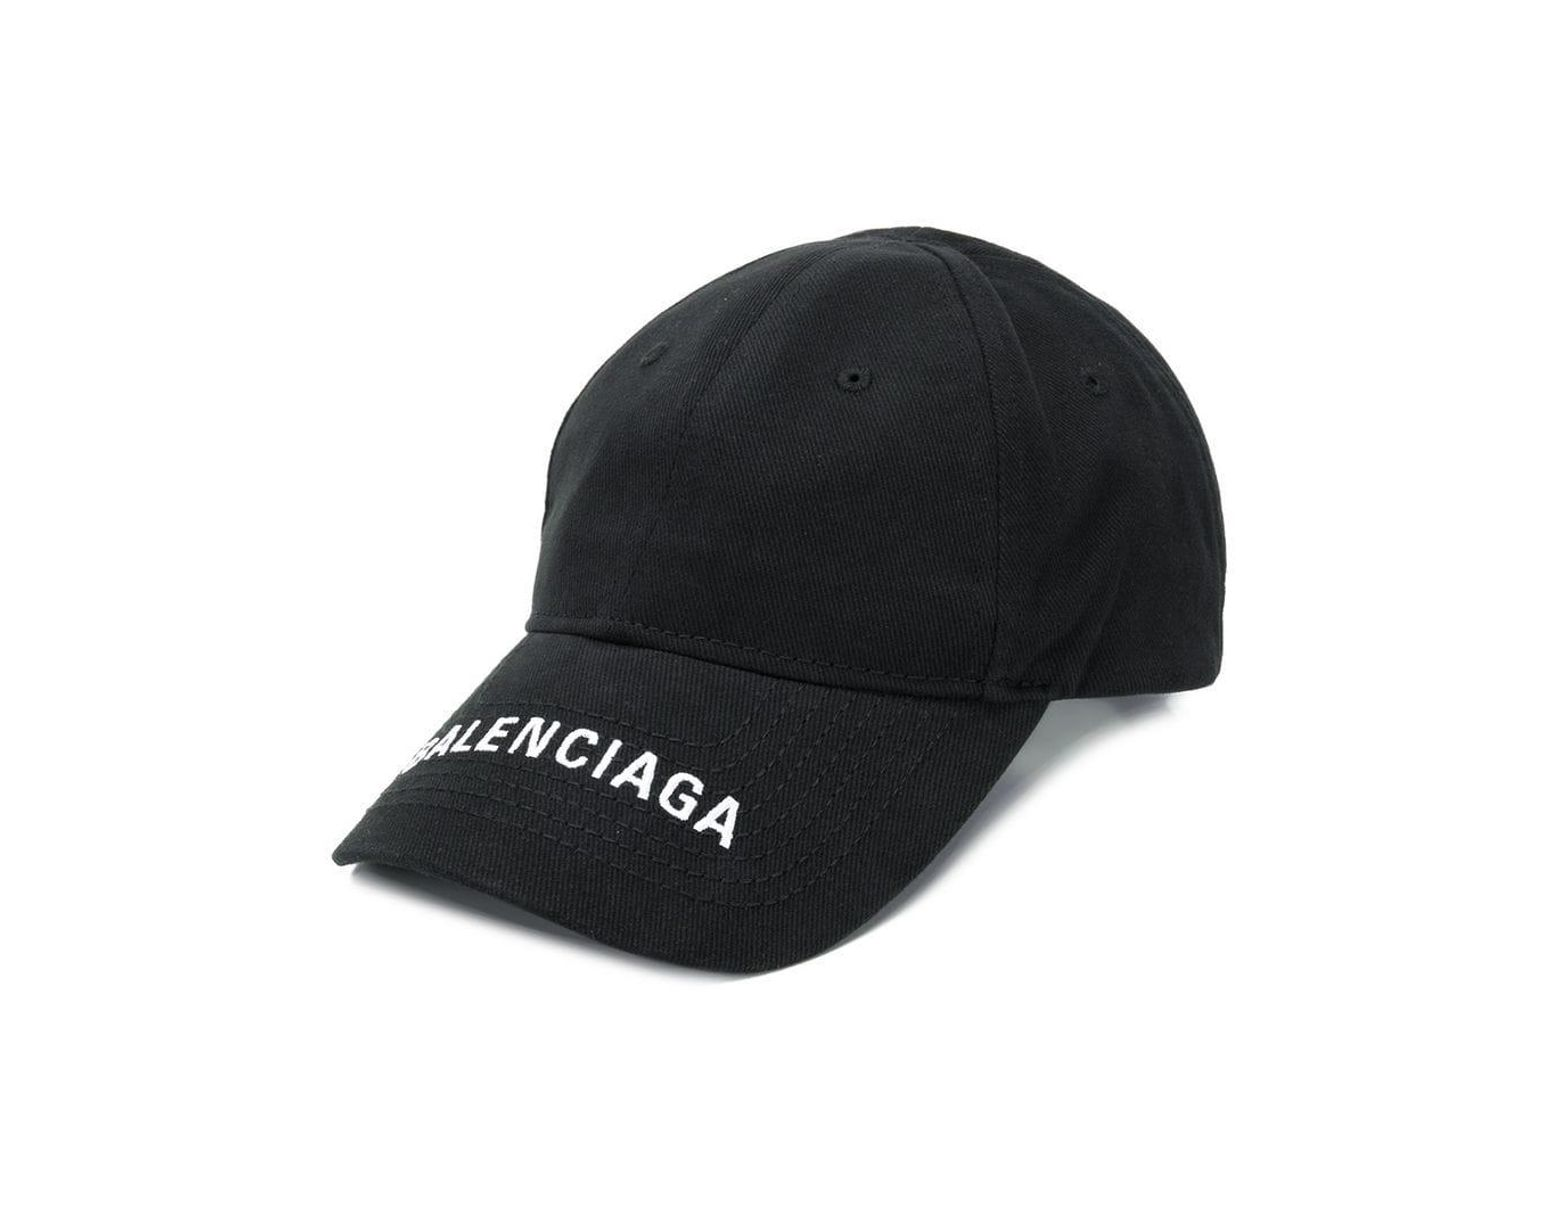 f5008fd7 Balenciaga Logo Embroidered Cap in Black - Save 40% - Lyst